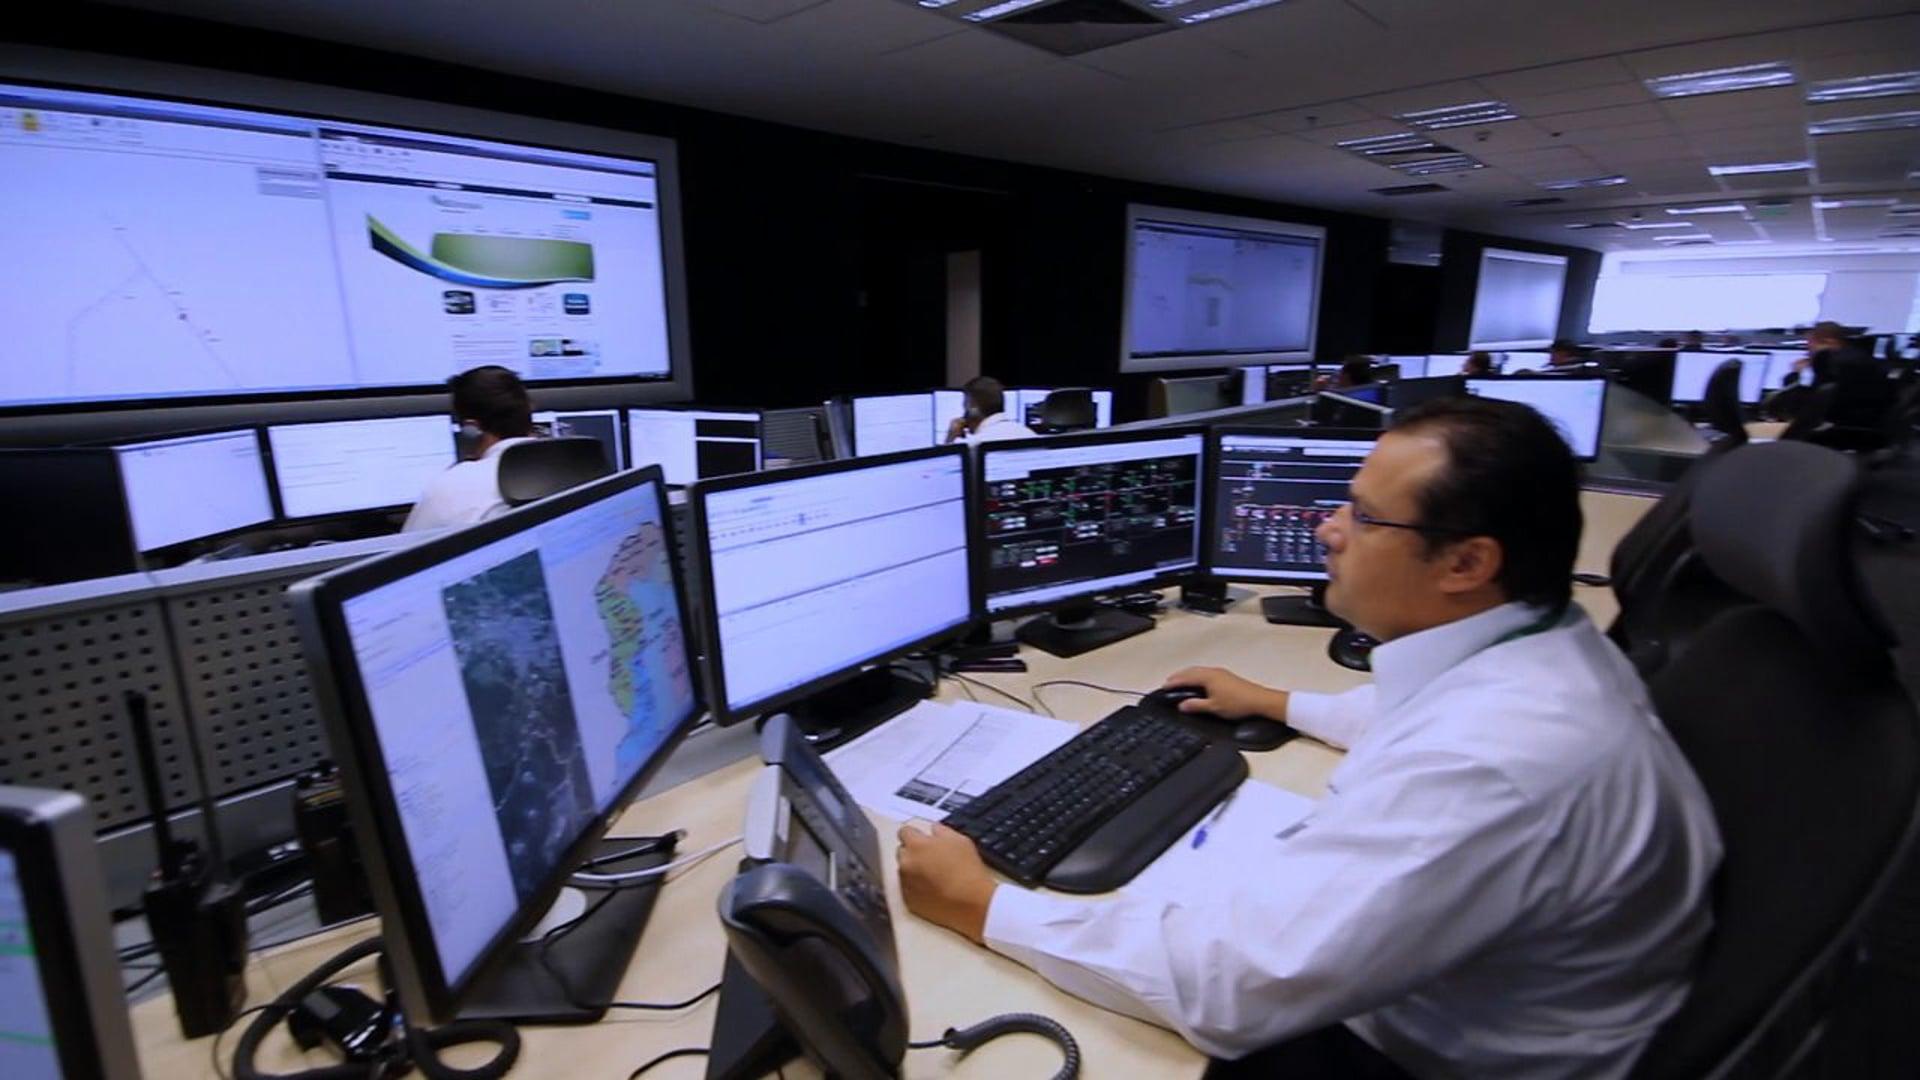 Operation Center Power Distribution - AES Eletropaulo - Brazil